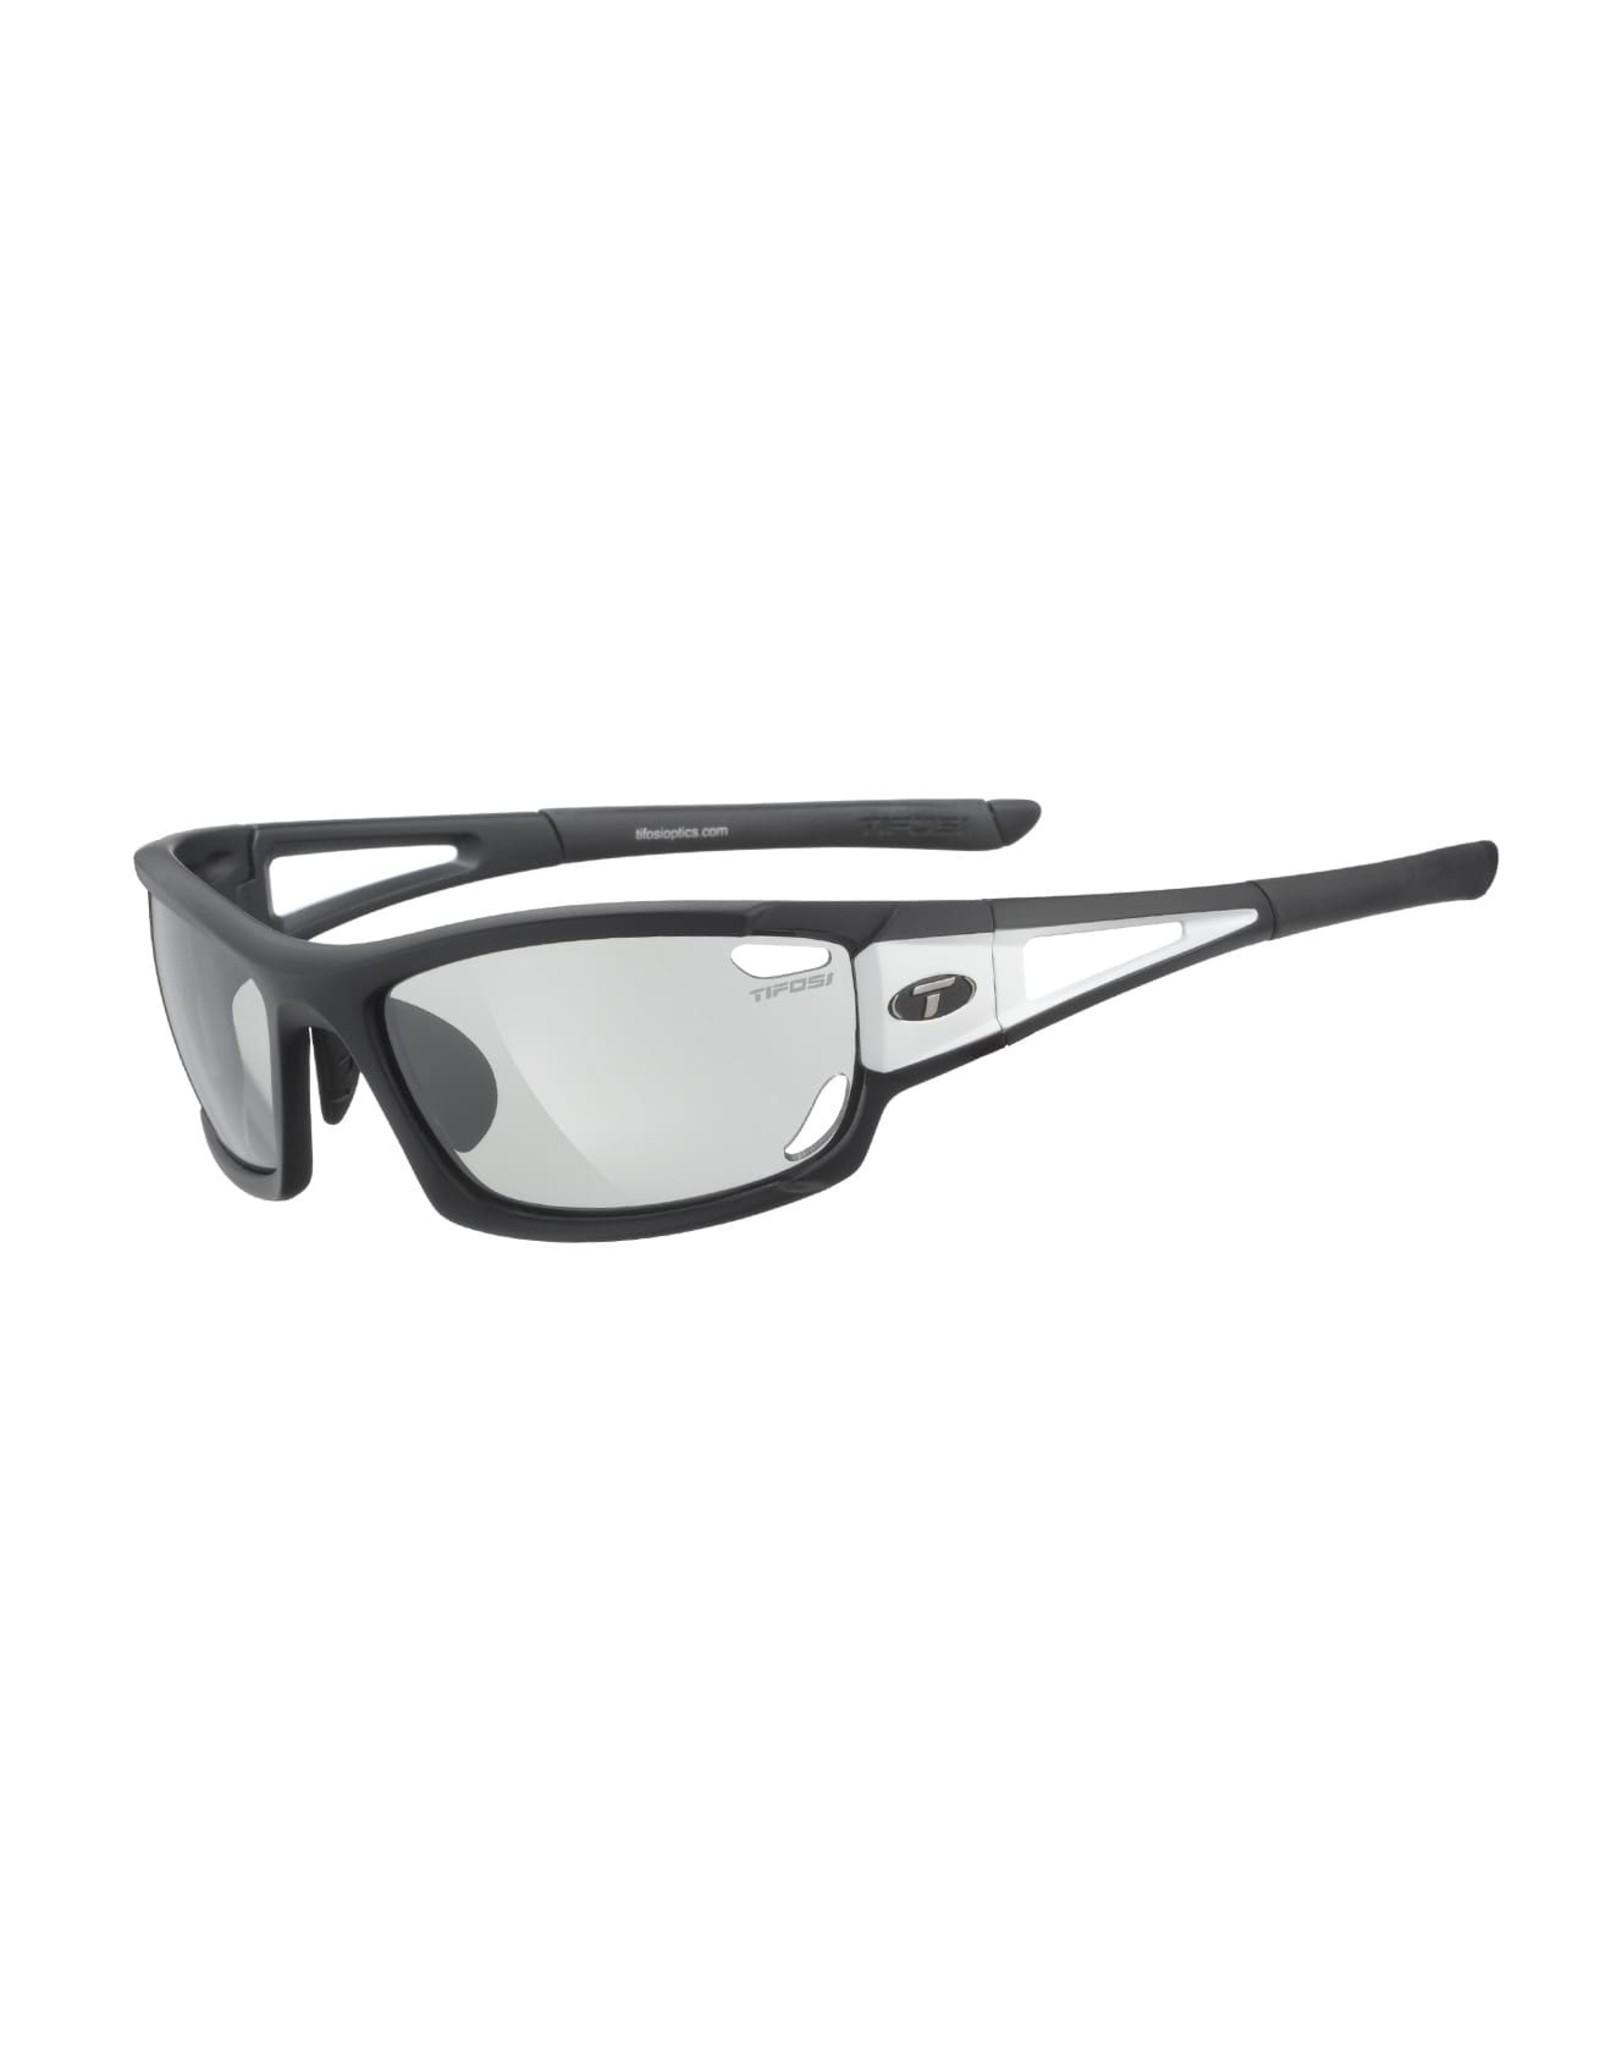 Tifosi Optics Dolomite 2.0, Black/White Light Night Fototec Lenses Glasses